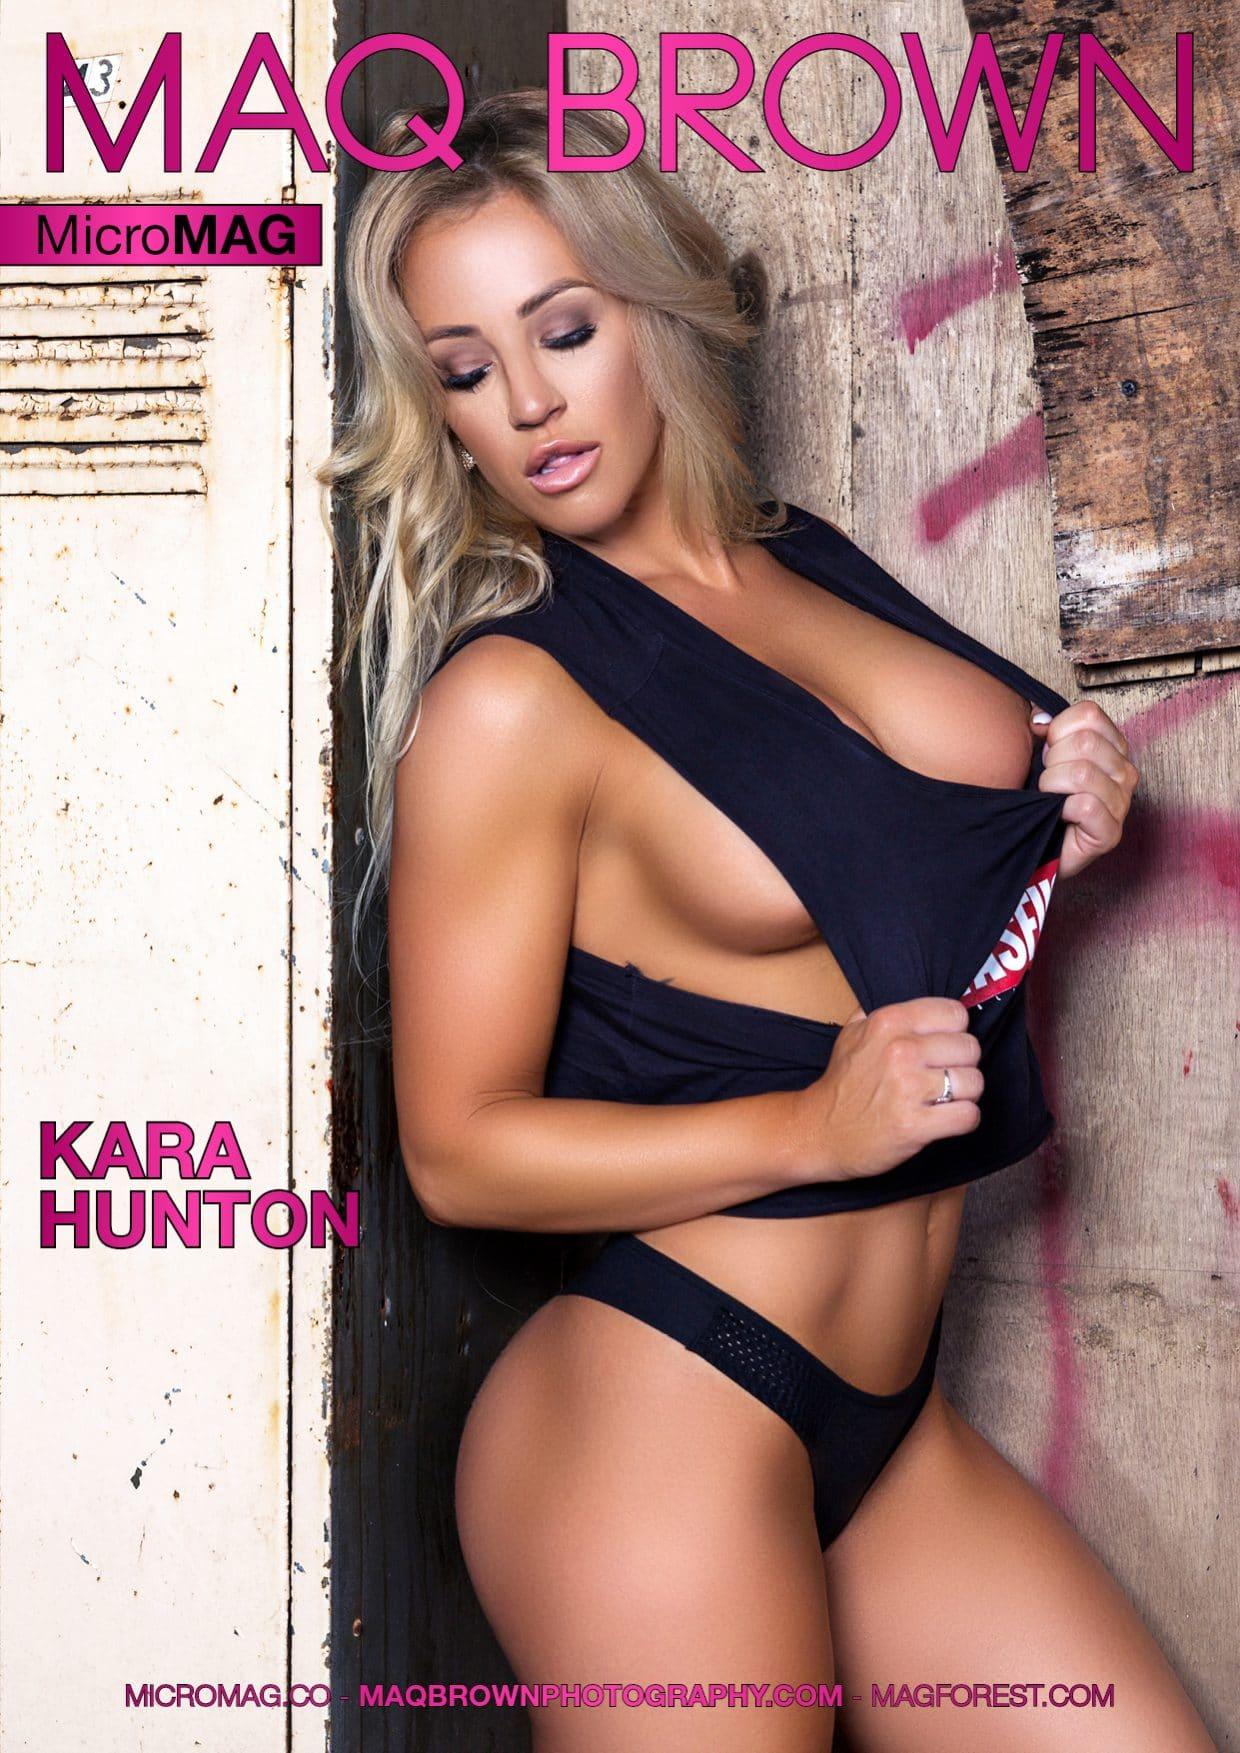 Maq Brown MicroMAG - Kara Hunton 1